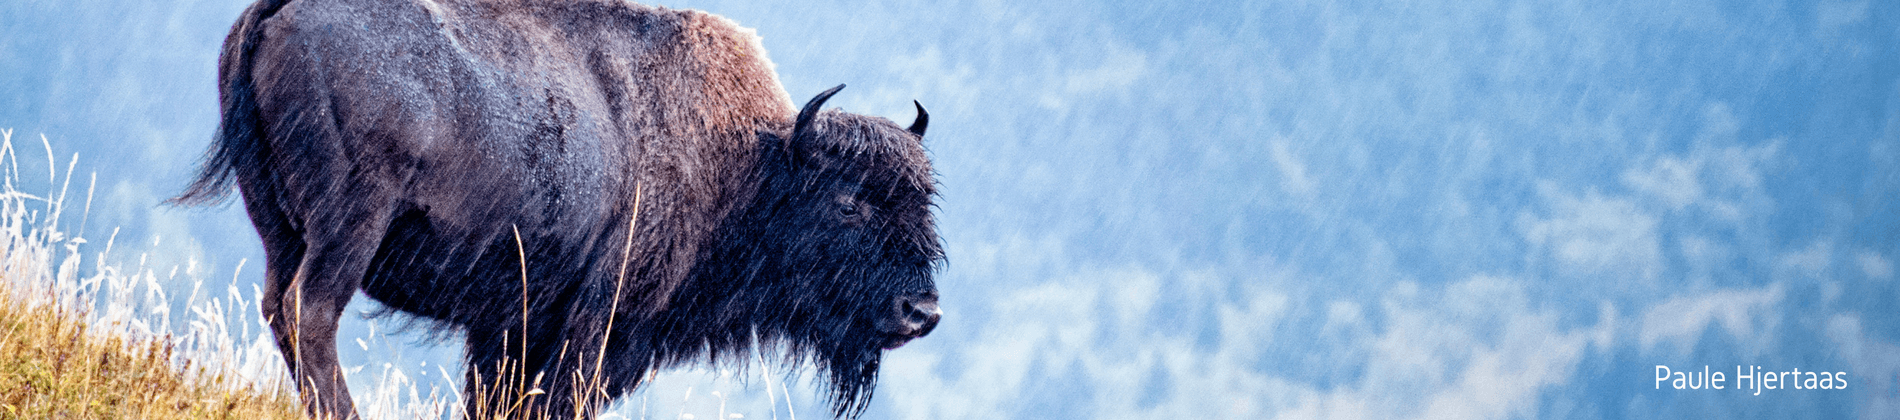 Image of a Buffalo